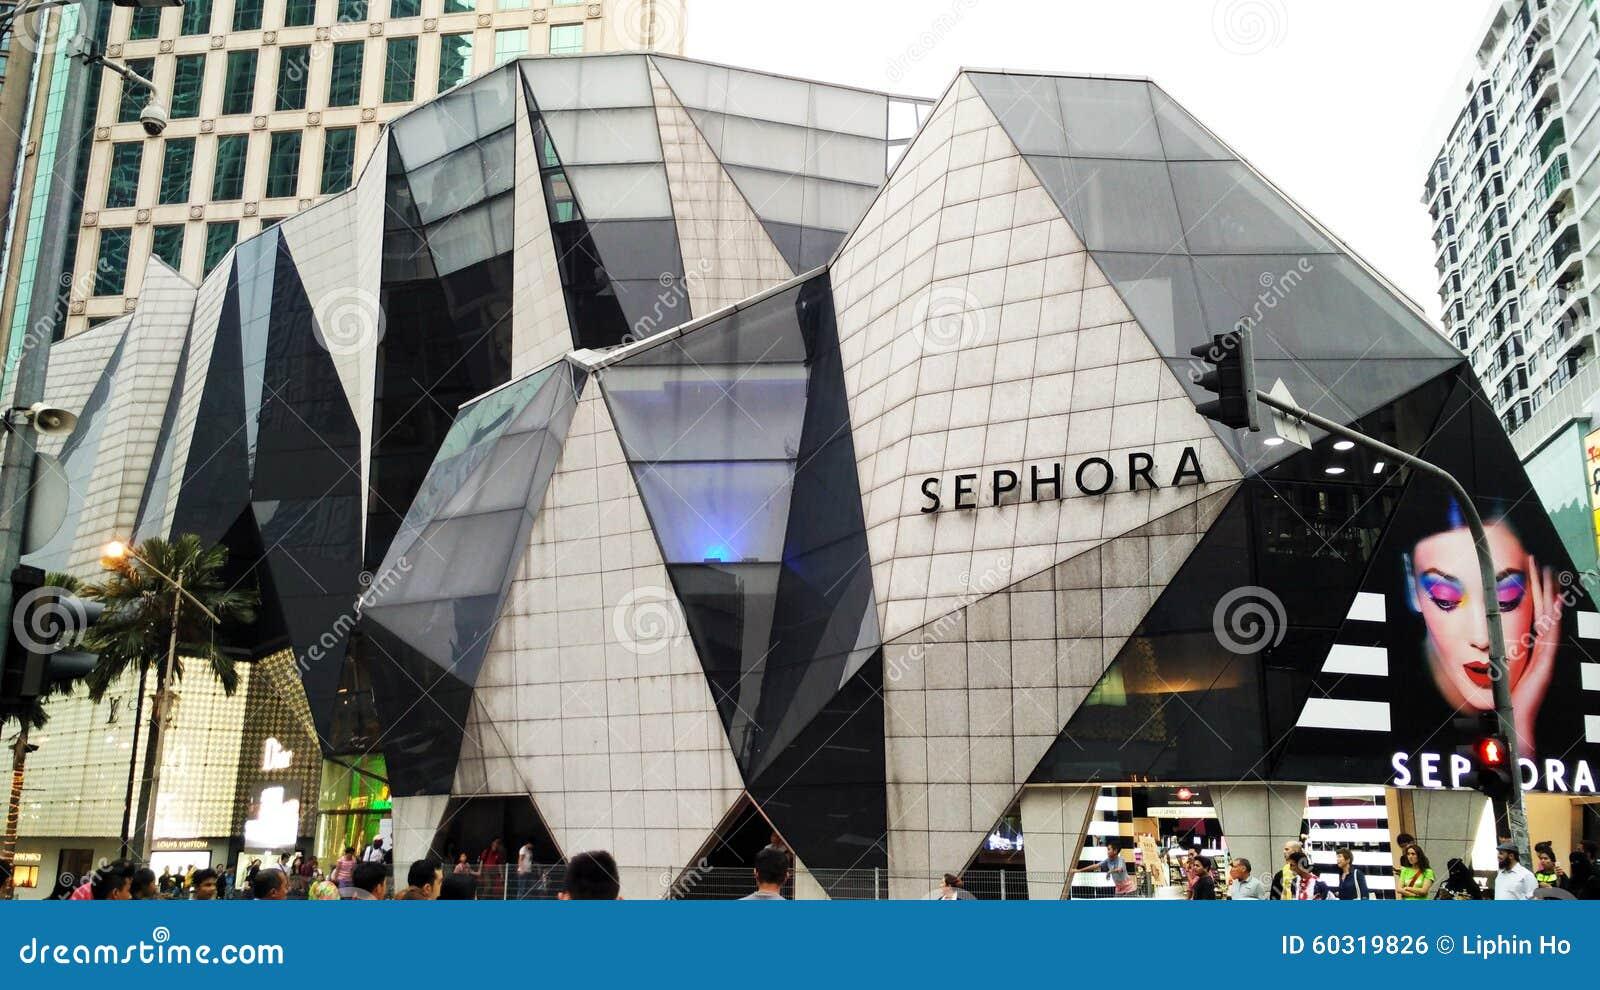 Sephora Malaysia at Bukit Bintang, Kuala Lumpur : Hit or